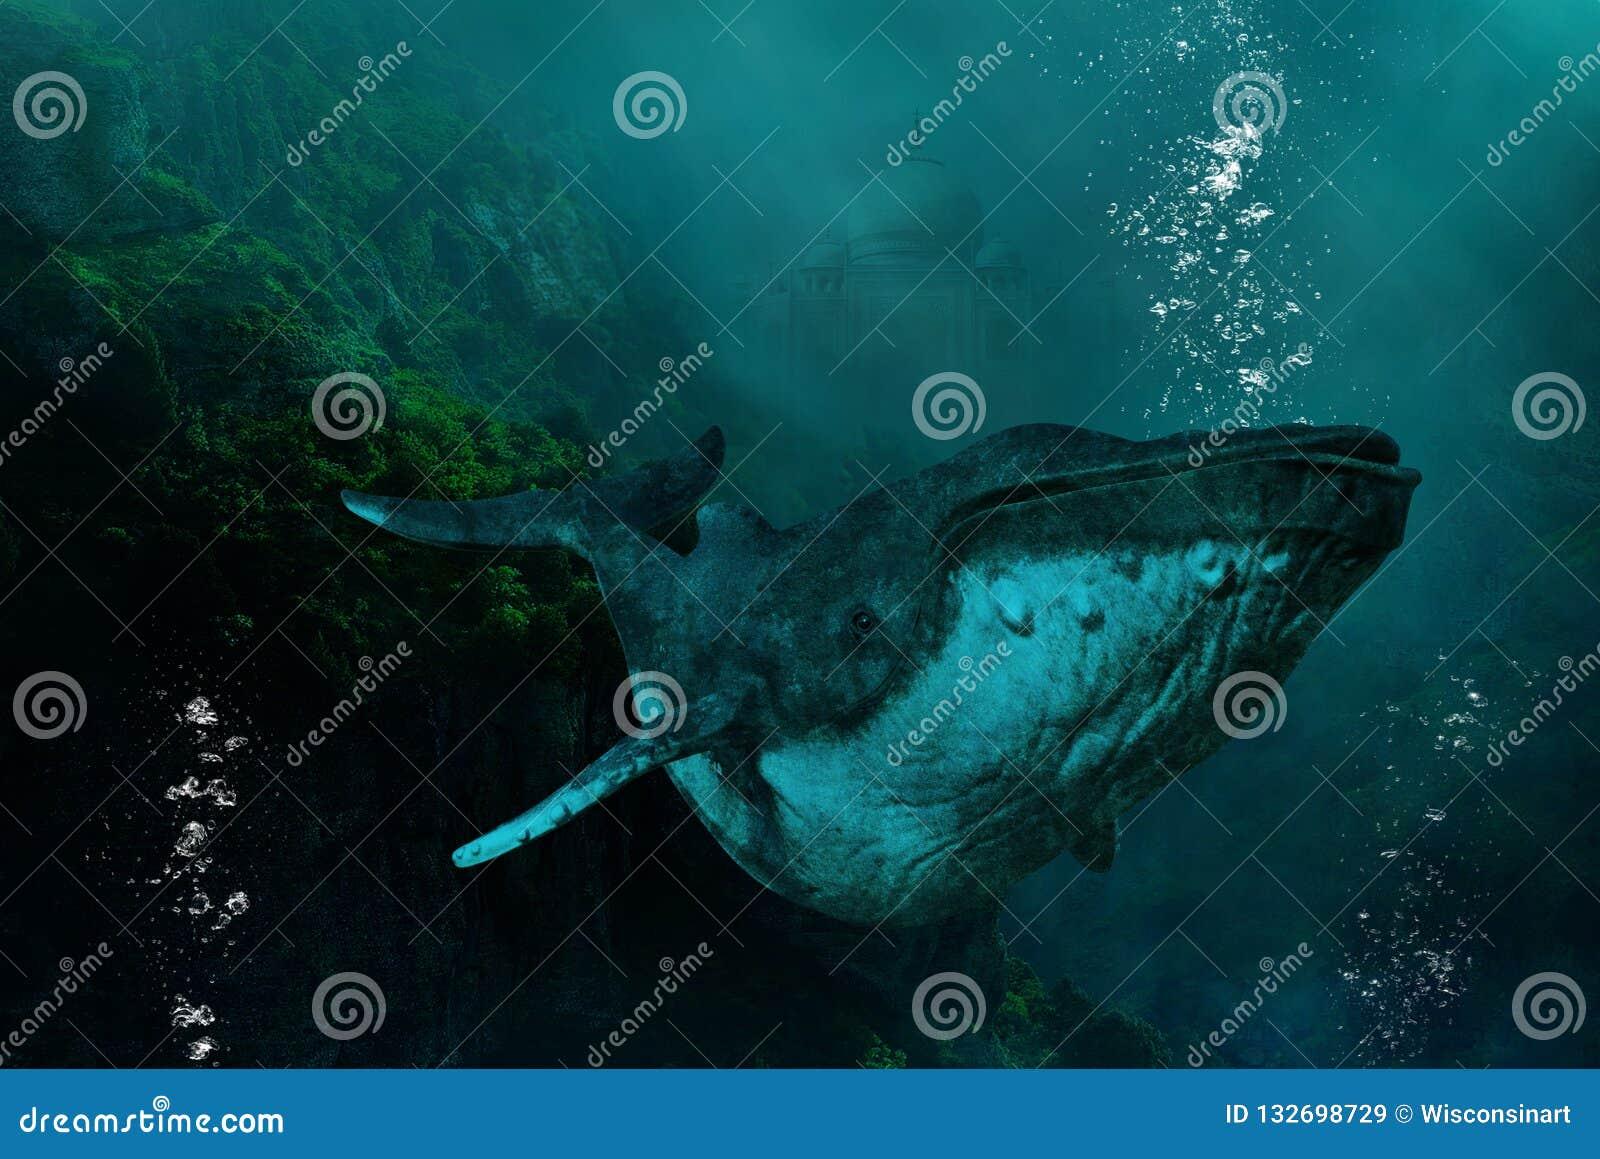 Baleia de corcunda submarina surreal, natureza